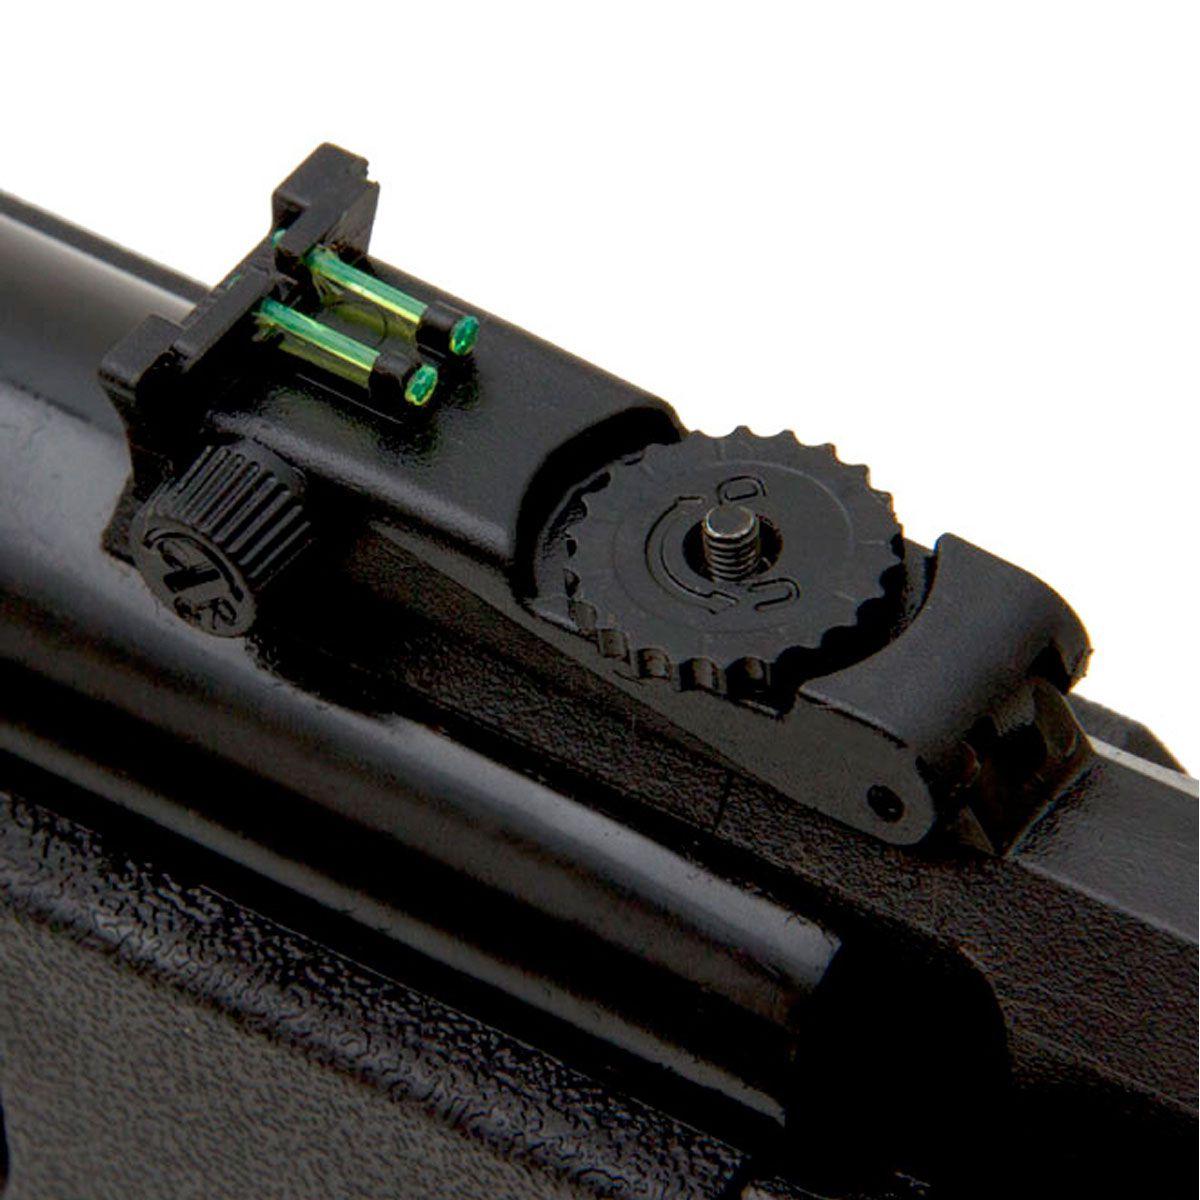 Carabina de Pressão CBC Nitro Advanced - 5,5mm